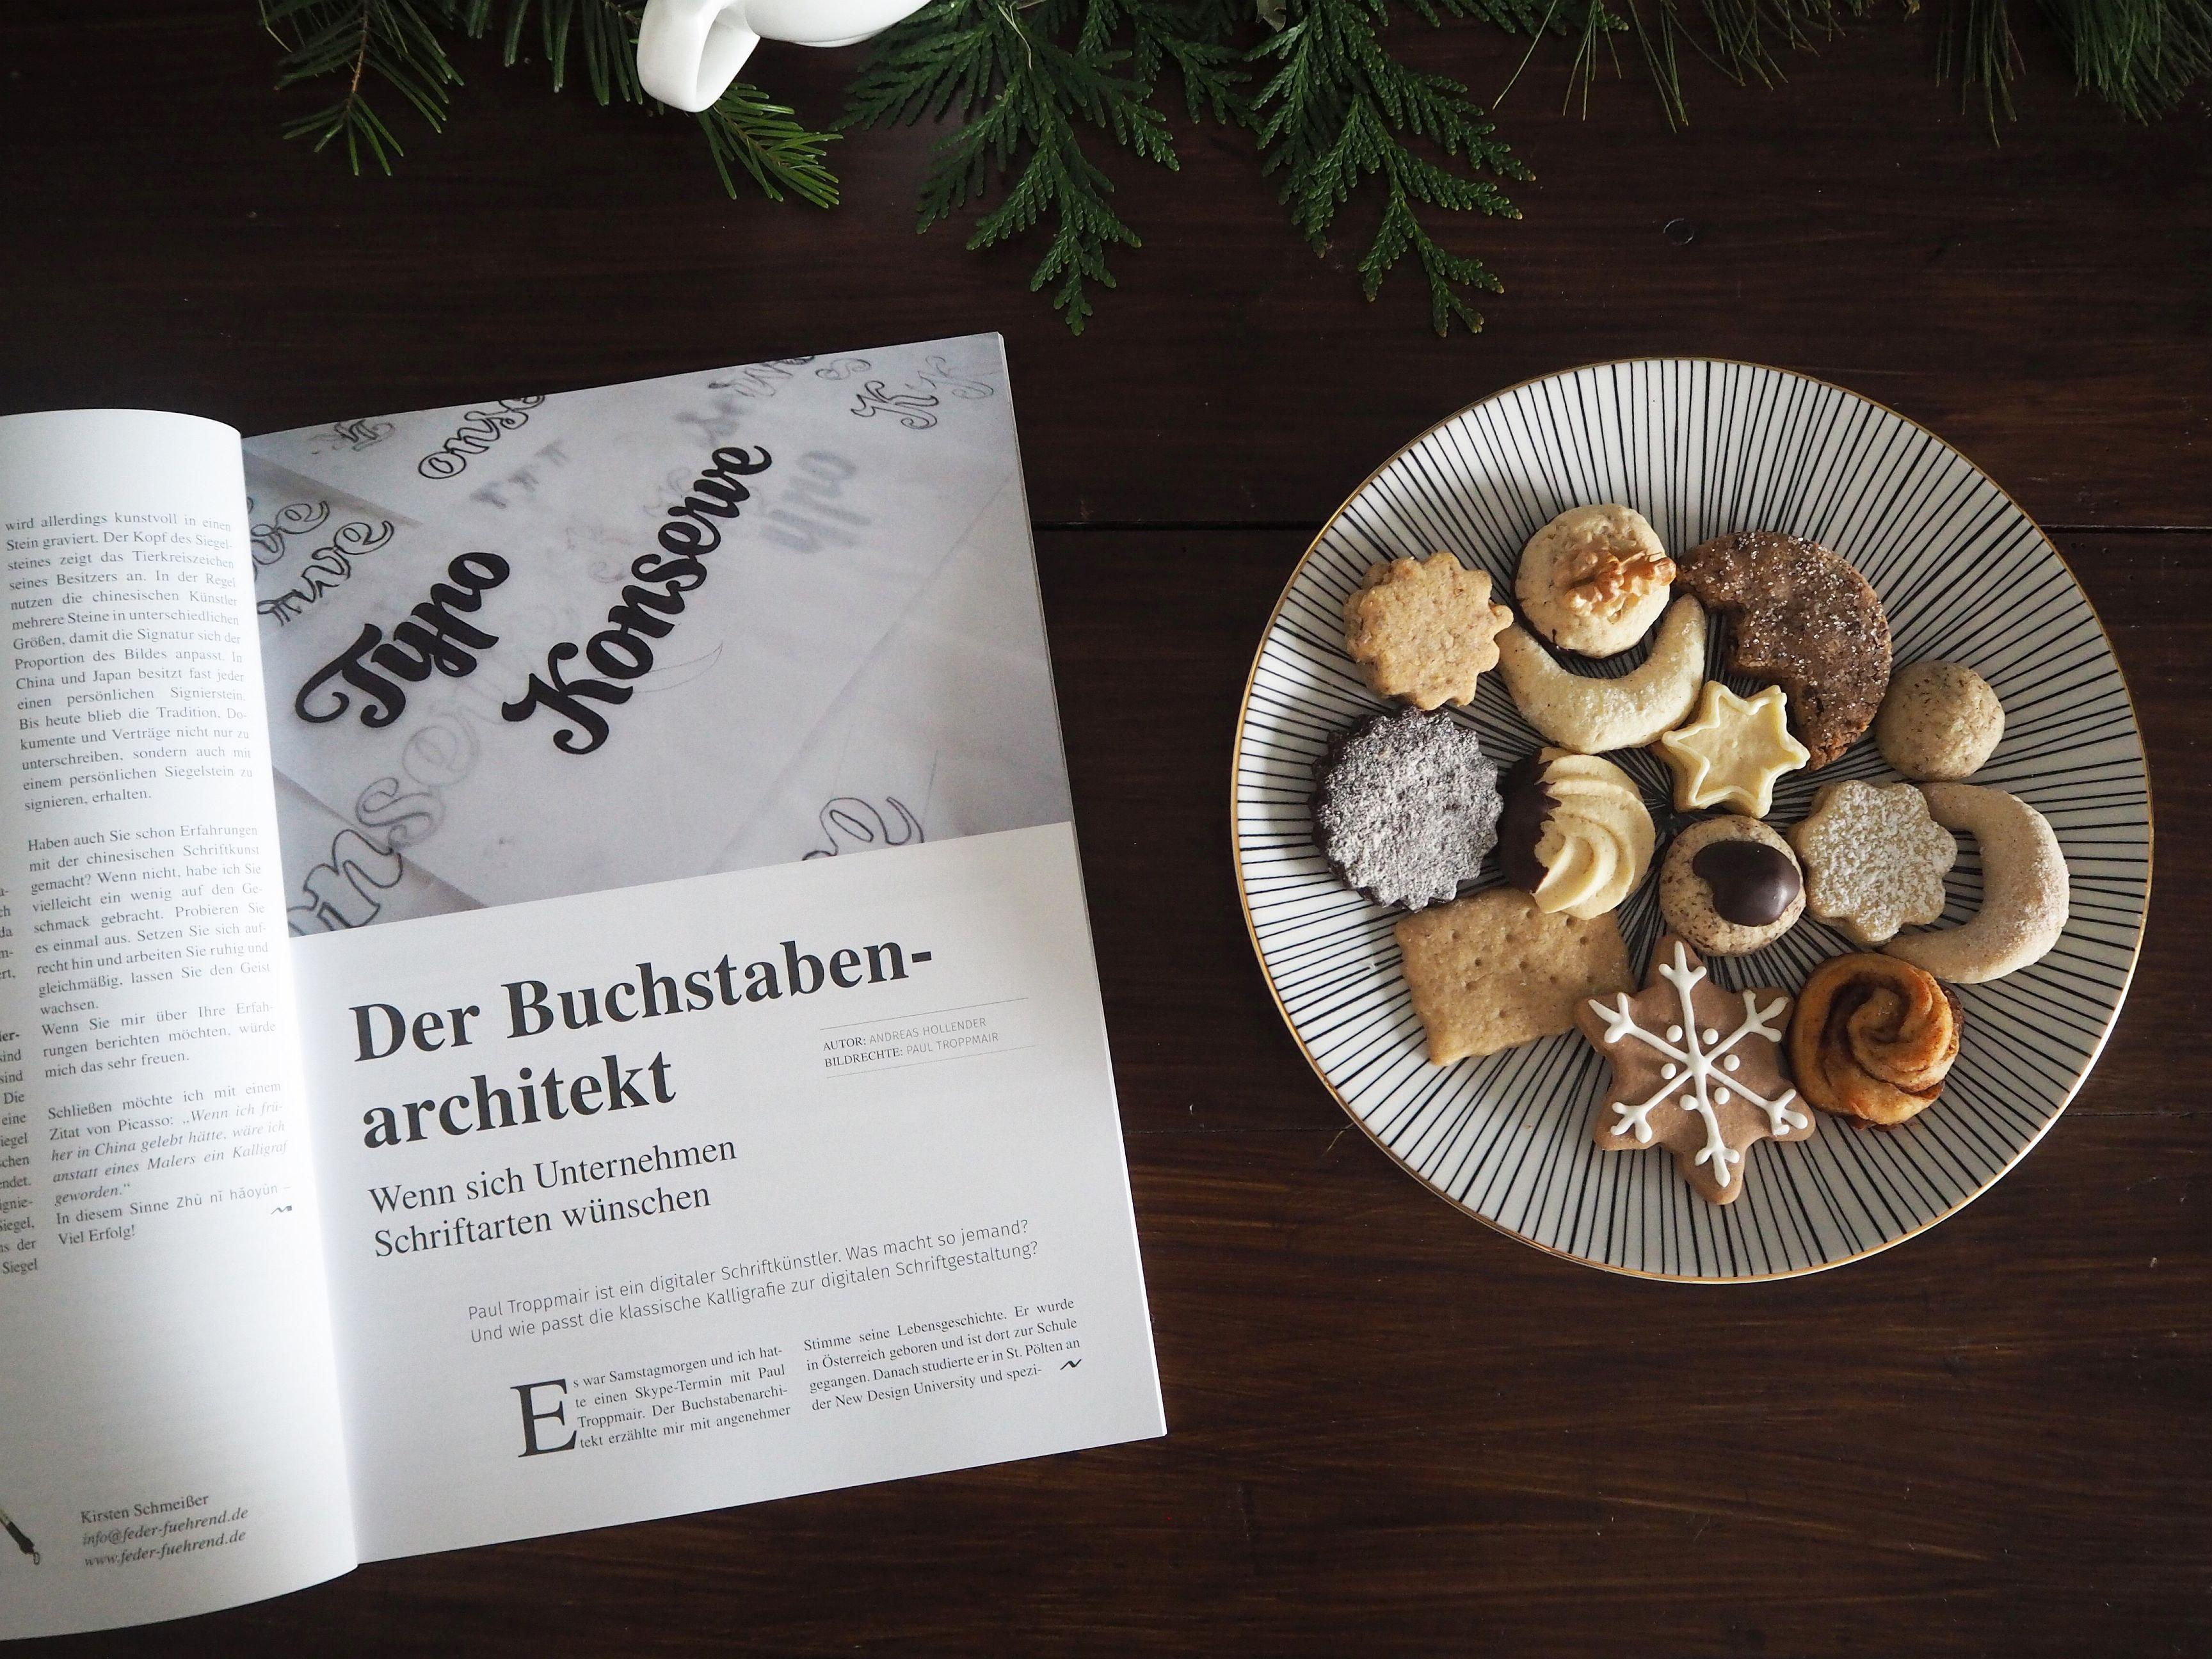 2017-12-skoen-och-kreativ-sonntagslektuere-zeitschrift-kalligrafie-aktuell (8)